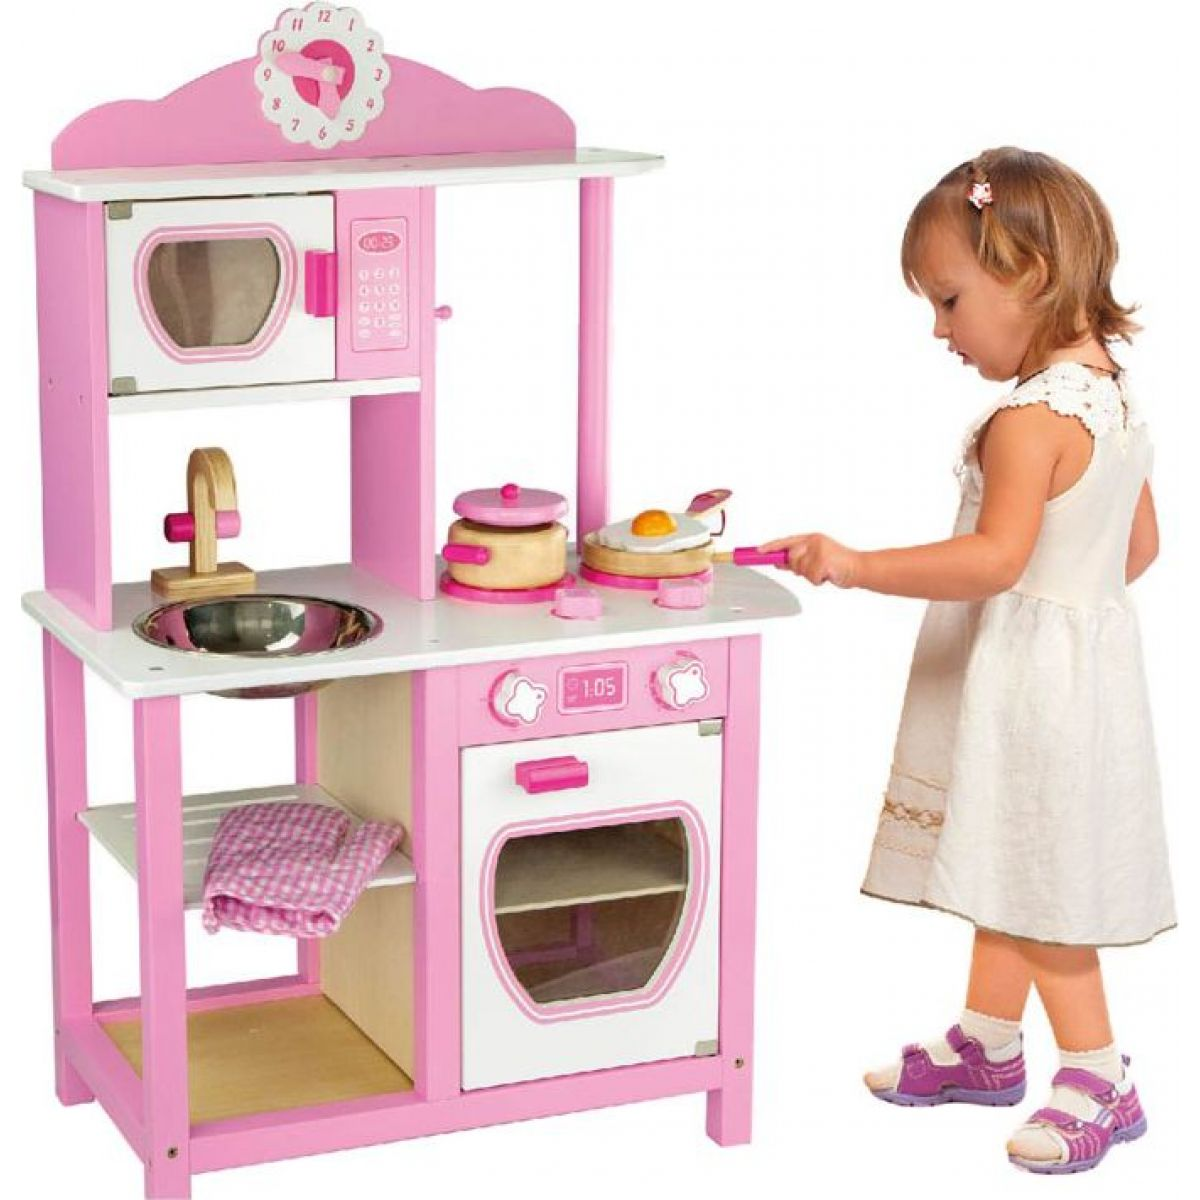 HM Studio Studo Wood Kuchyň princezna